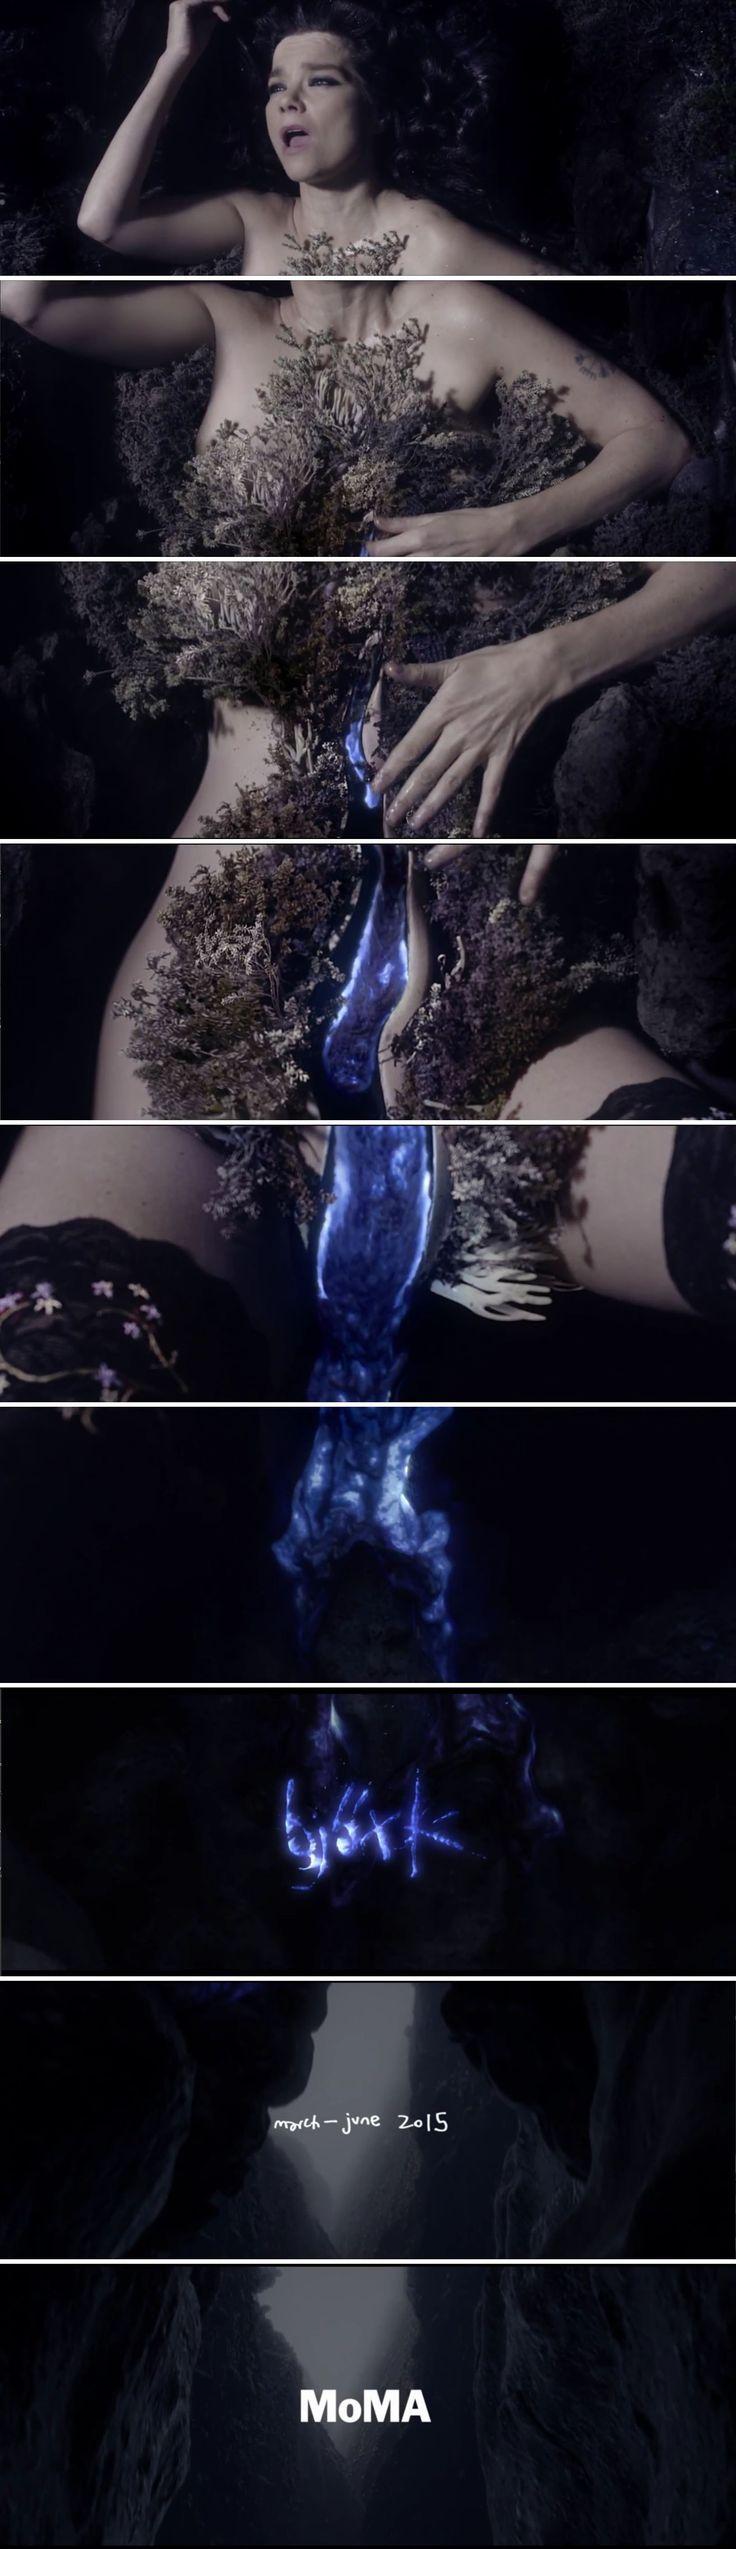 "Bjork's ""Black Lake"" Trailer from MOMA."